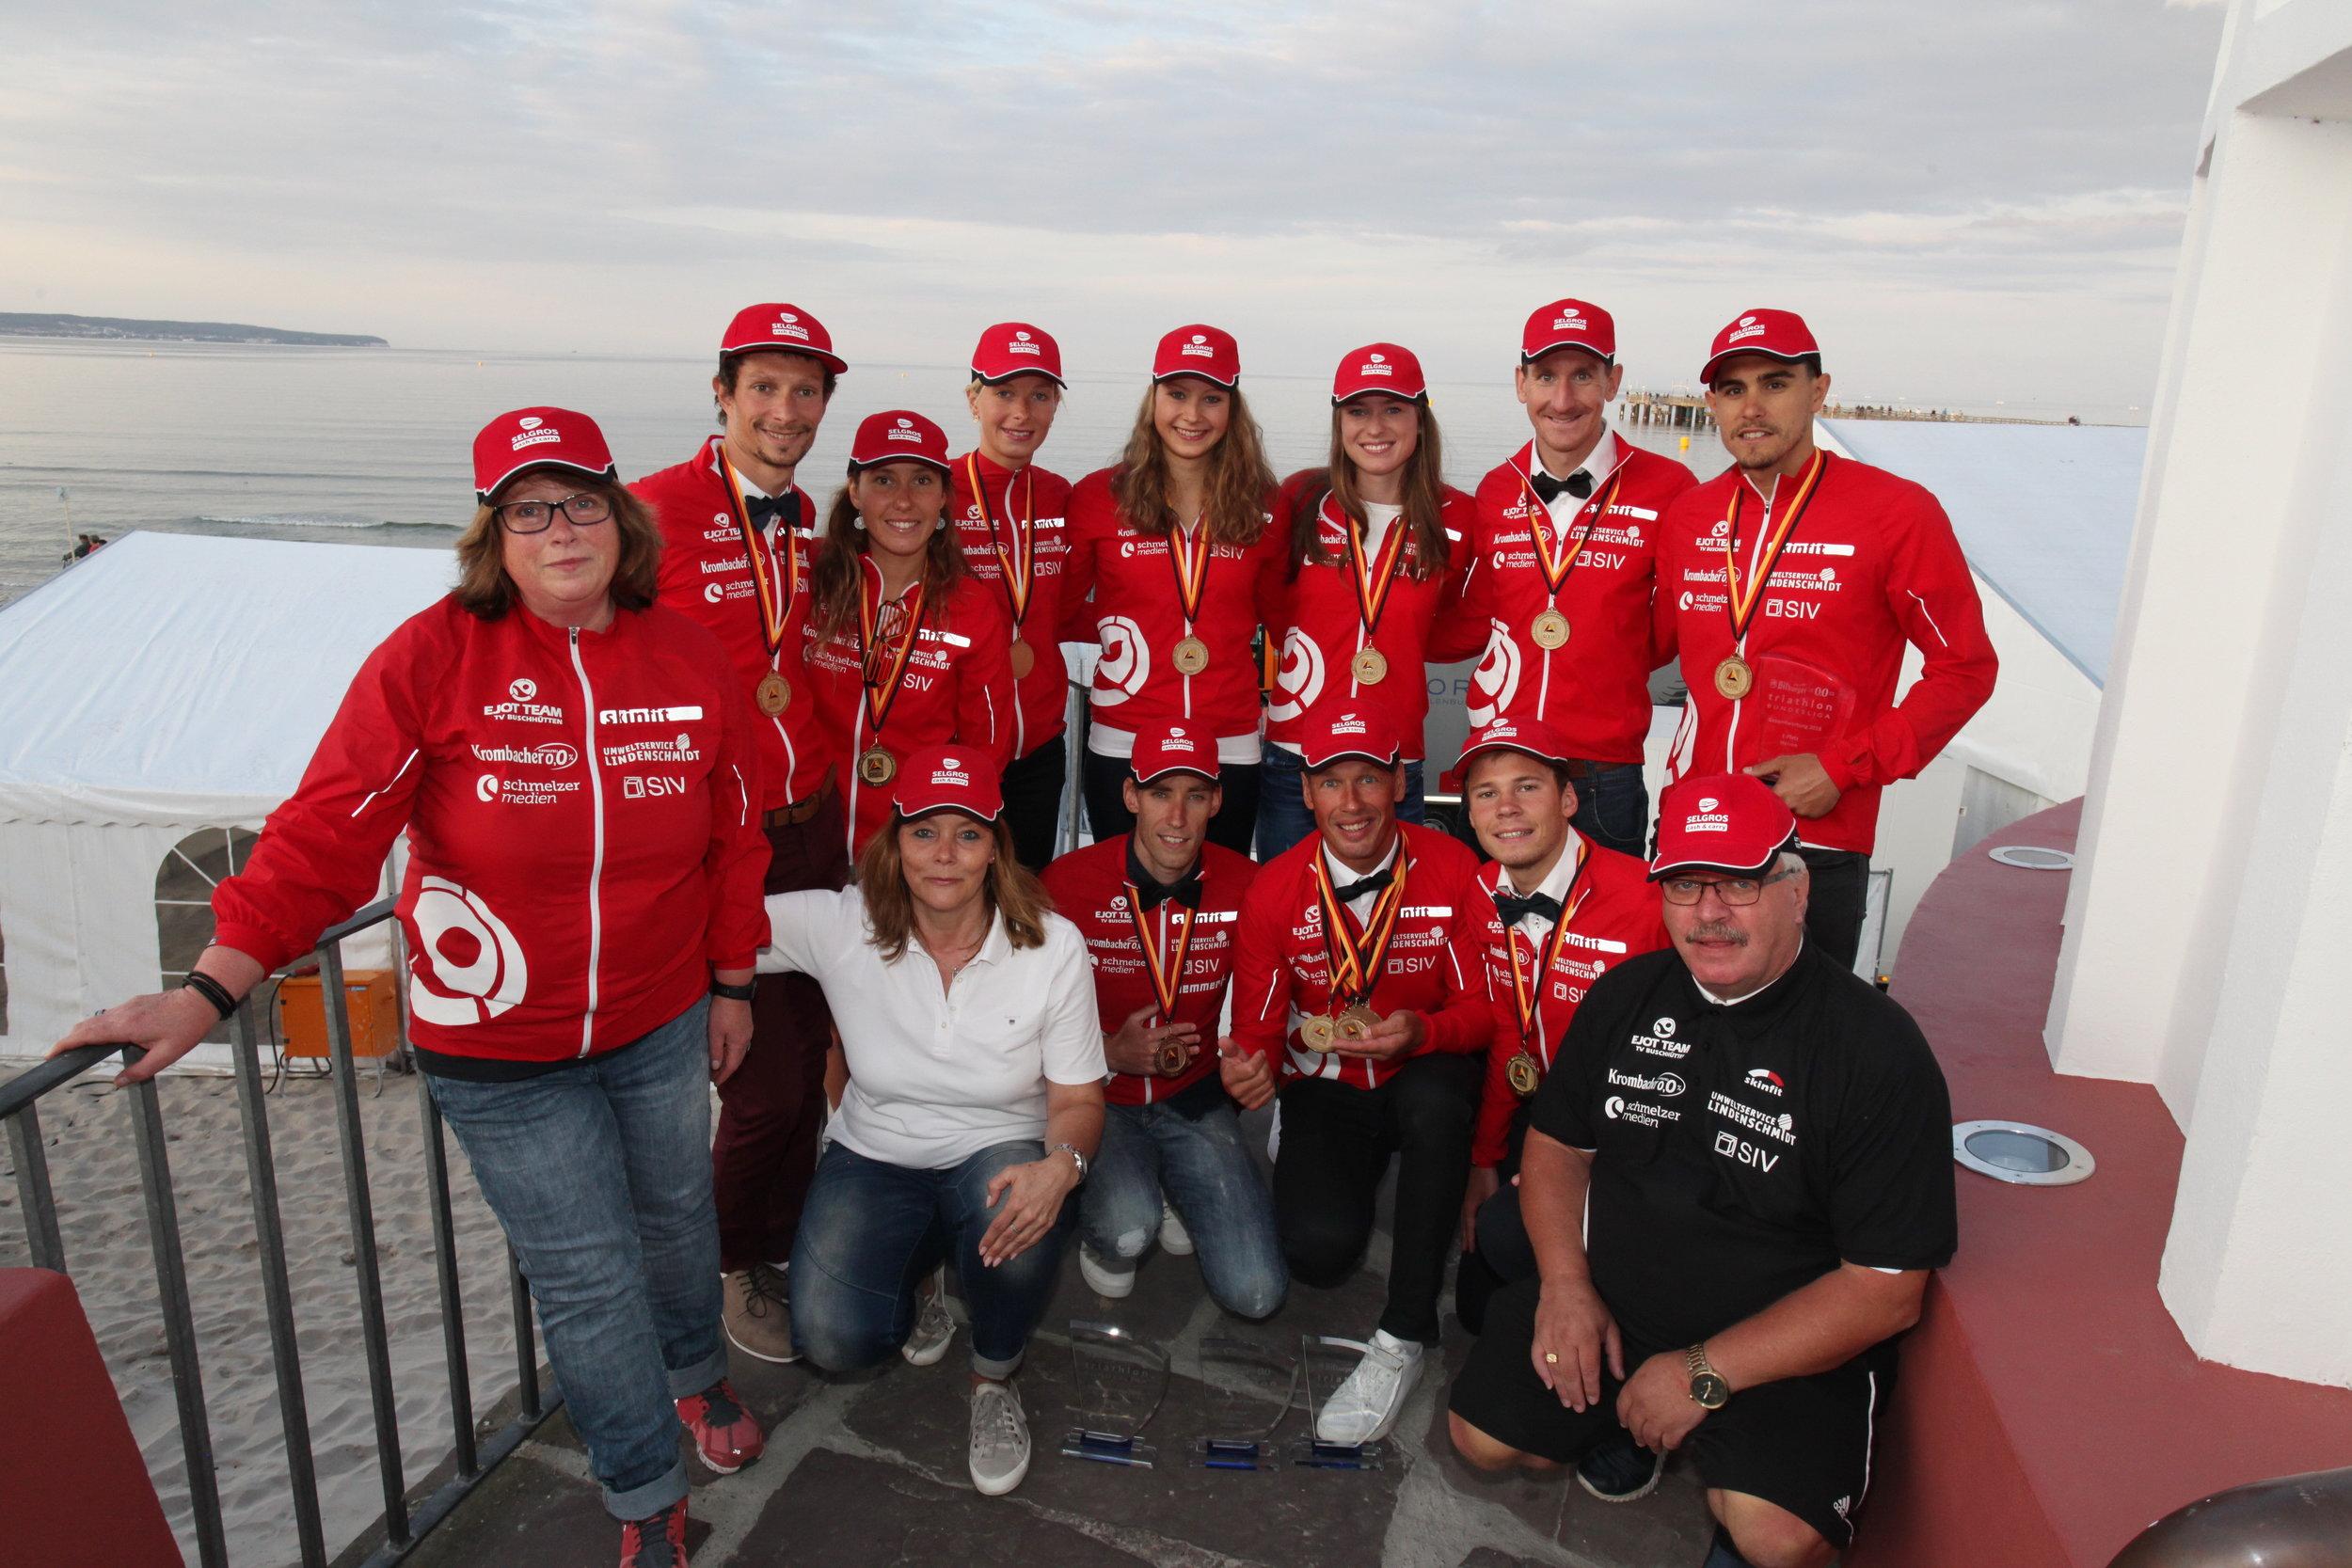 2018-09-08_EJOT Team komplett.JPG